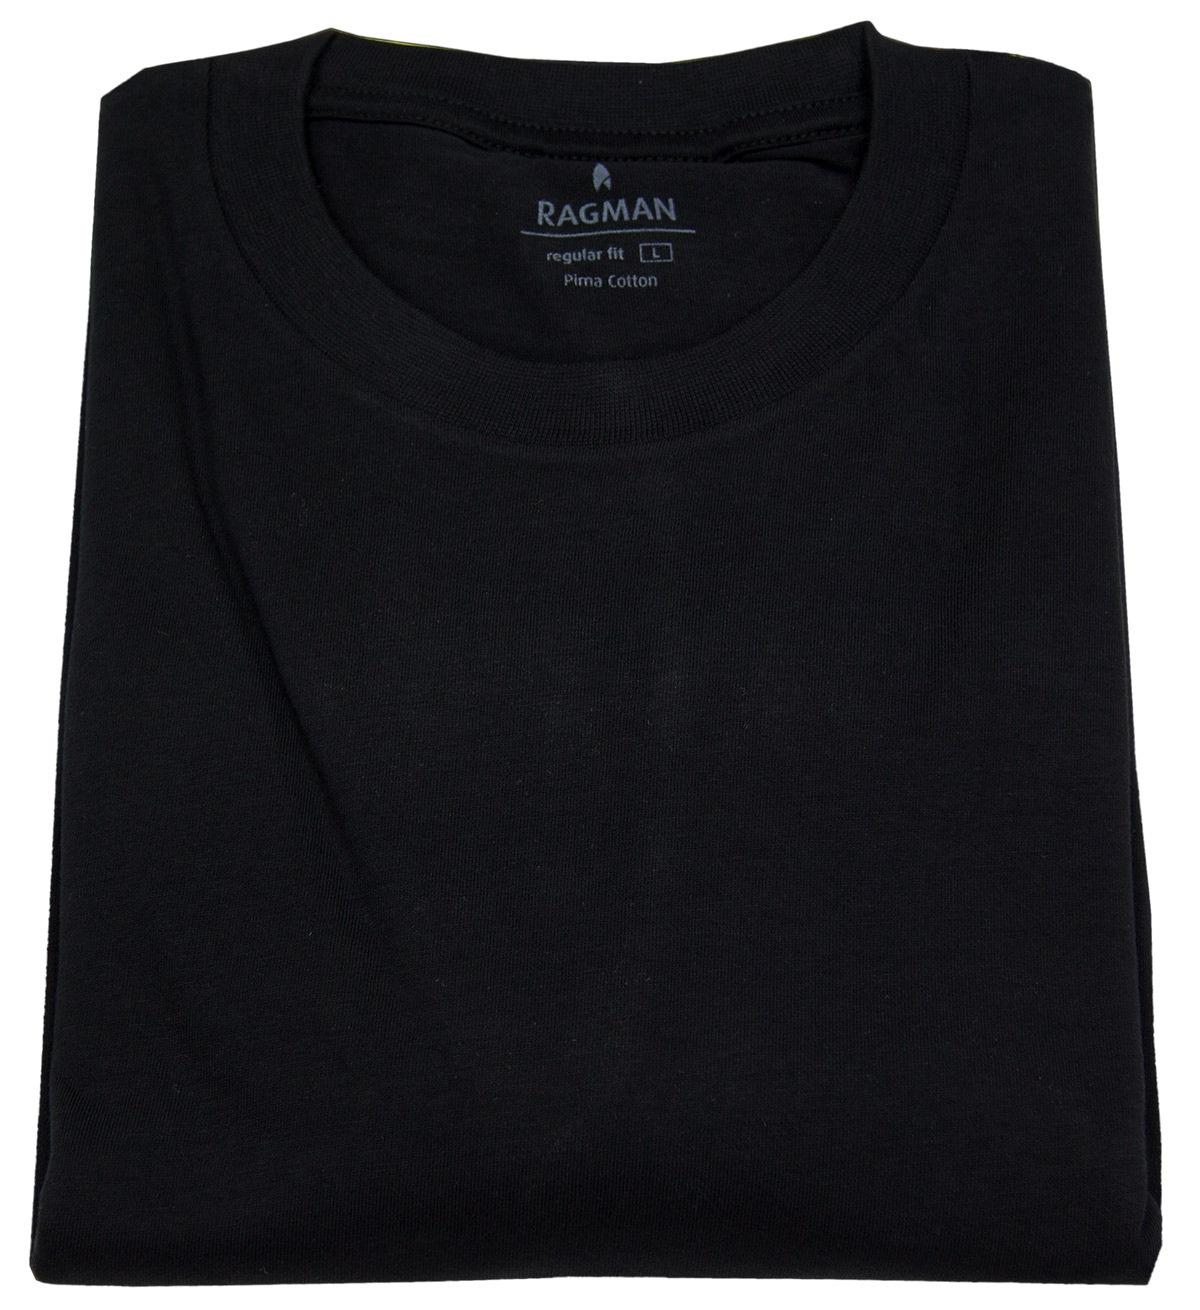 a6bb1fe3fed4cf Ragman T-Shirt Doppelpack - Rundhals - schwarz - 40000 009